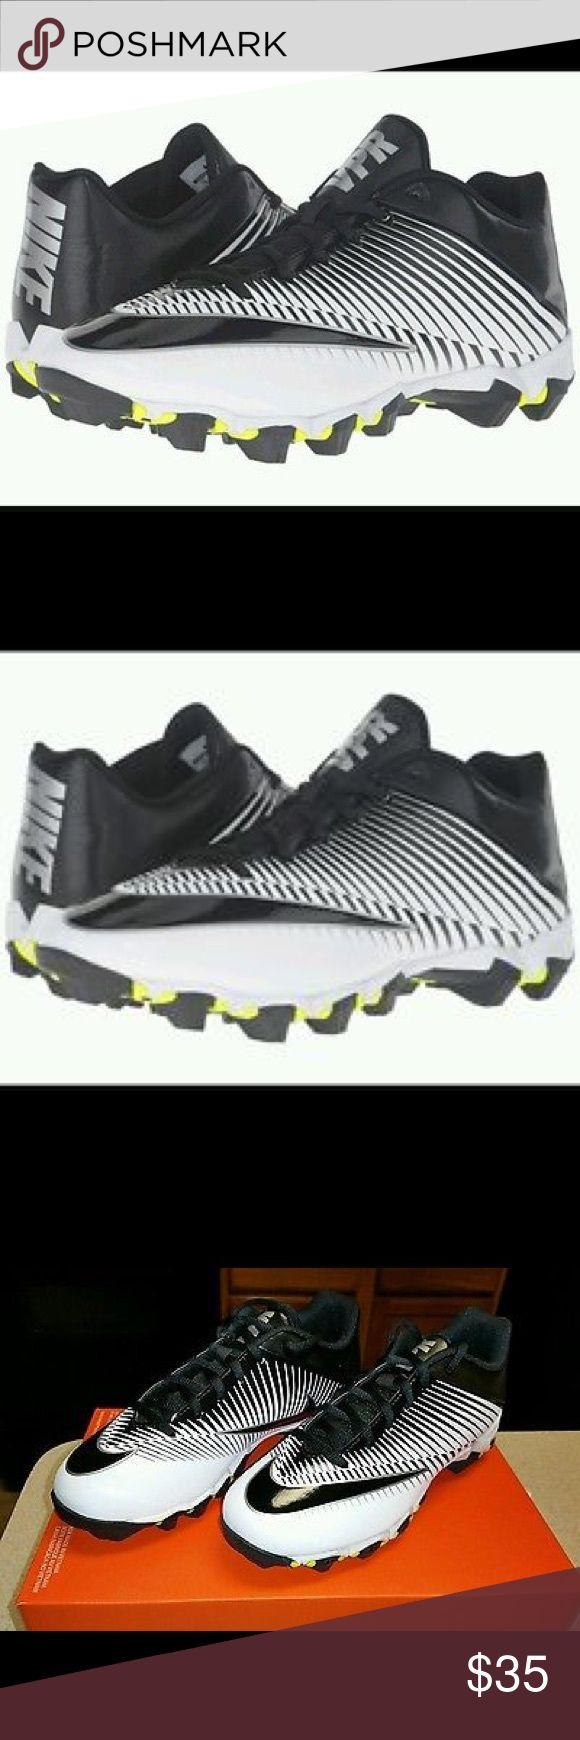 Brand New Vapor Shark Brand New Vapor Shark  Nike 833388-002 Vapor Shark 2 Black Football Cleats Soccer Youth nike Shoes